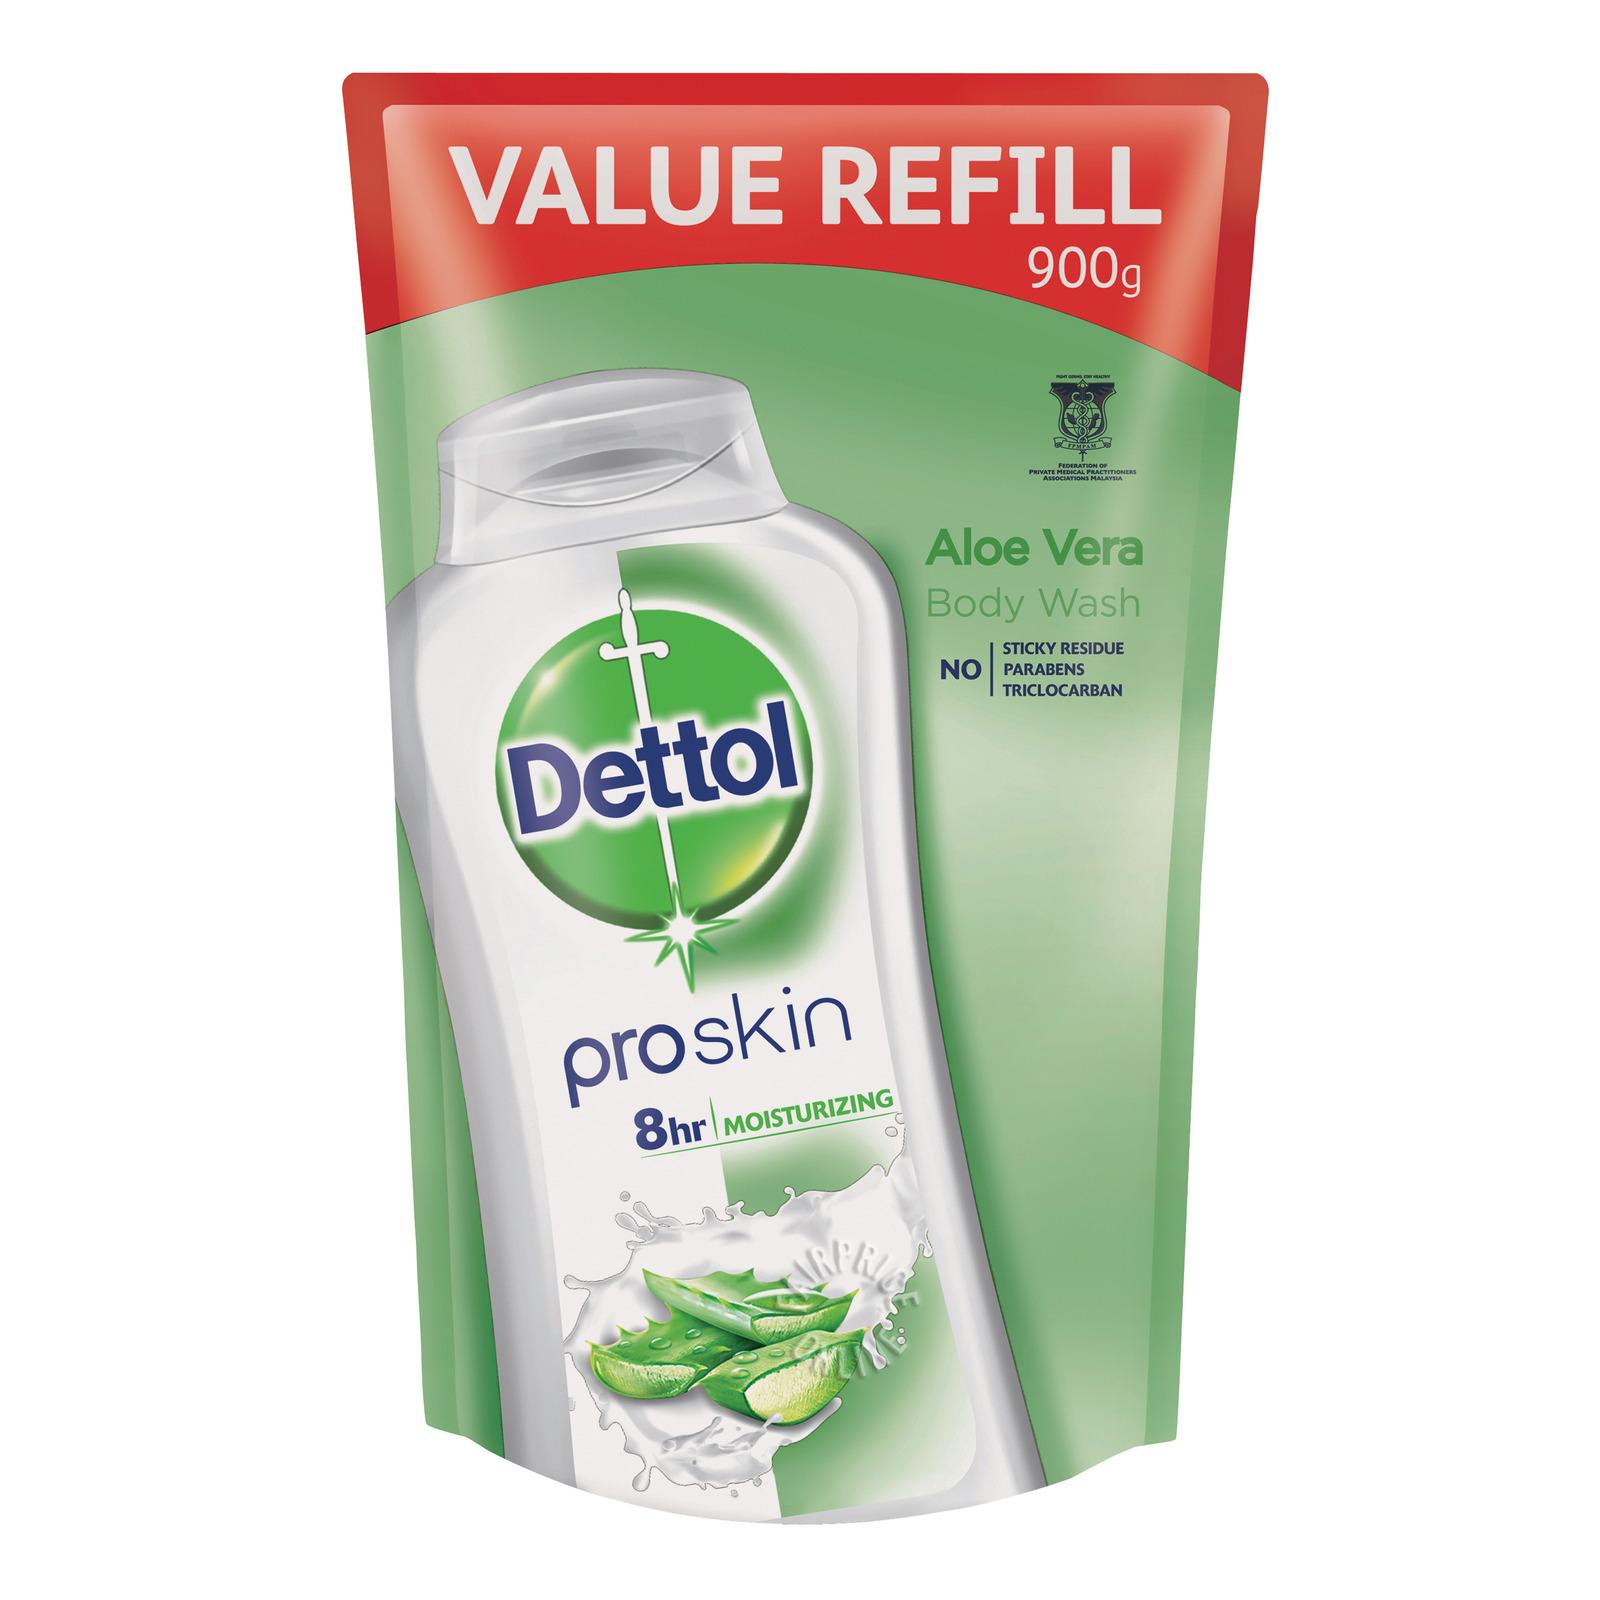 Dettol Proskin Antibacterial Body Wash Refill - Aloe Vera